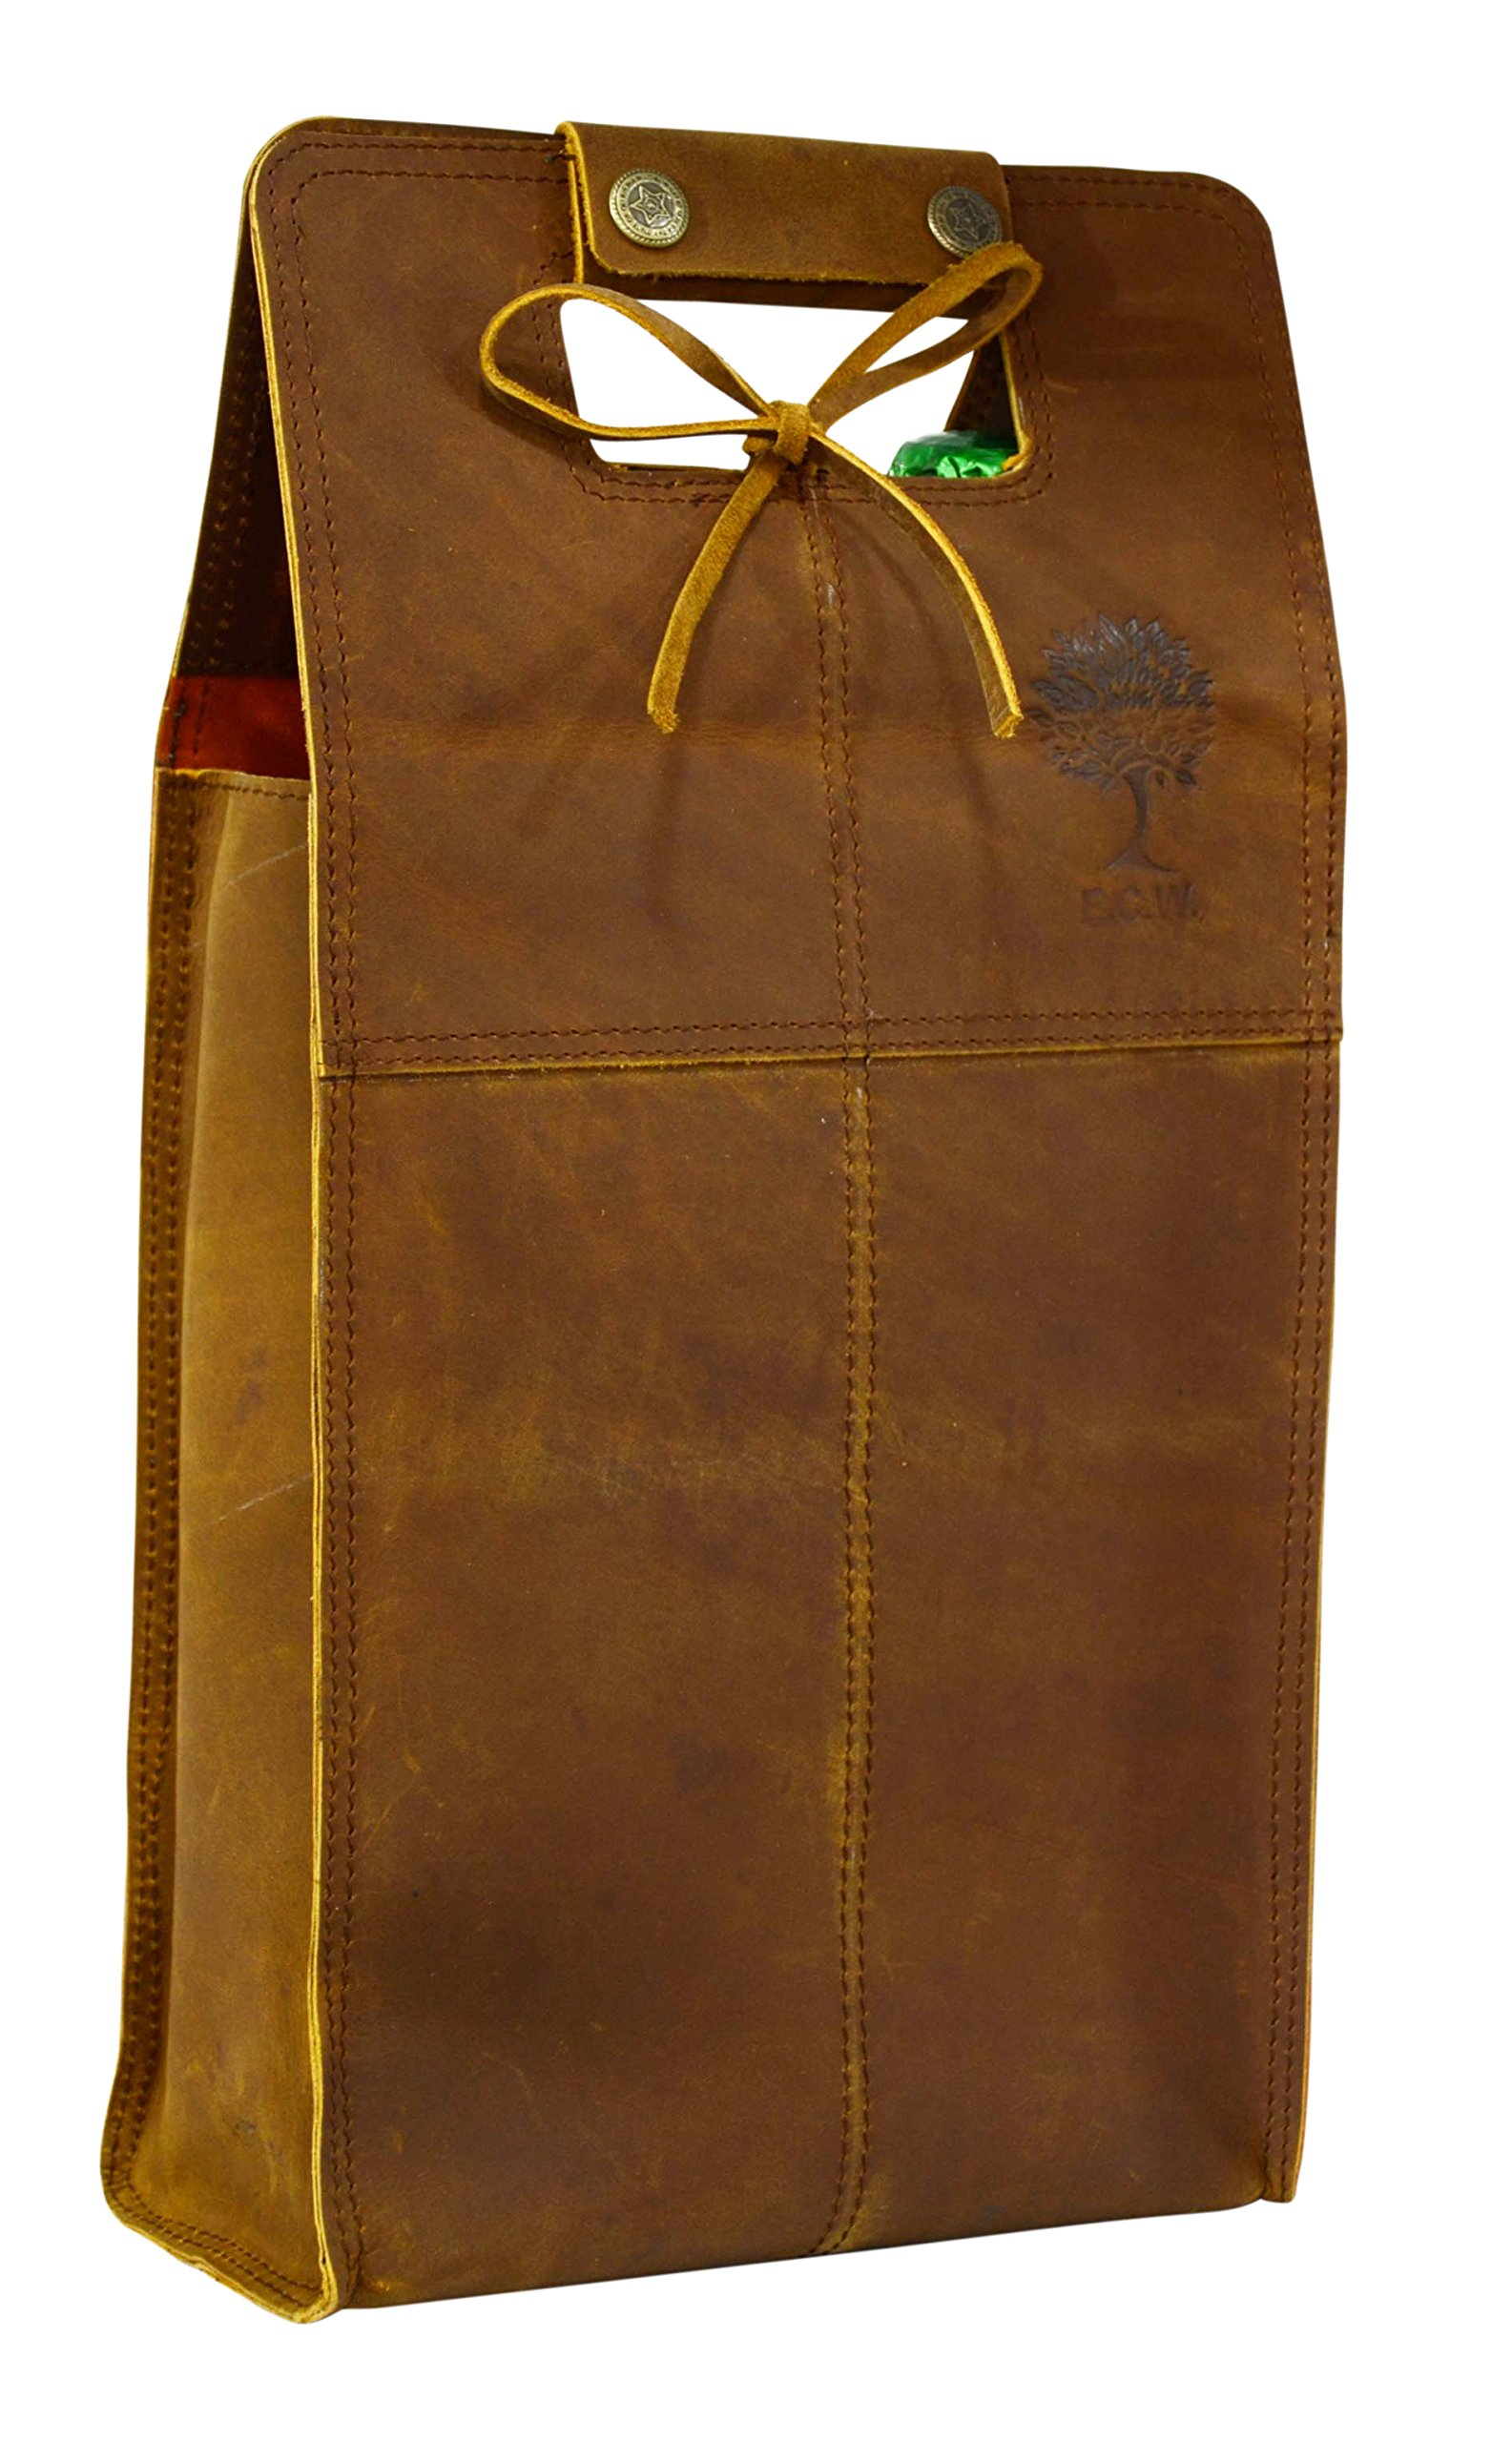 Double Wine Bottle Carrier Bag Leather Bottle Holder Tote Reusable Gift Bag Champagne Case, Valentines Gift Bag by ECOCRAFTWORLD (Image #5)